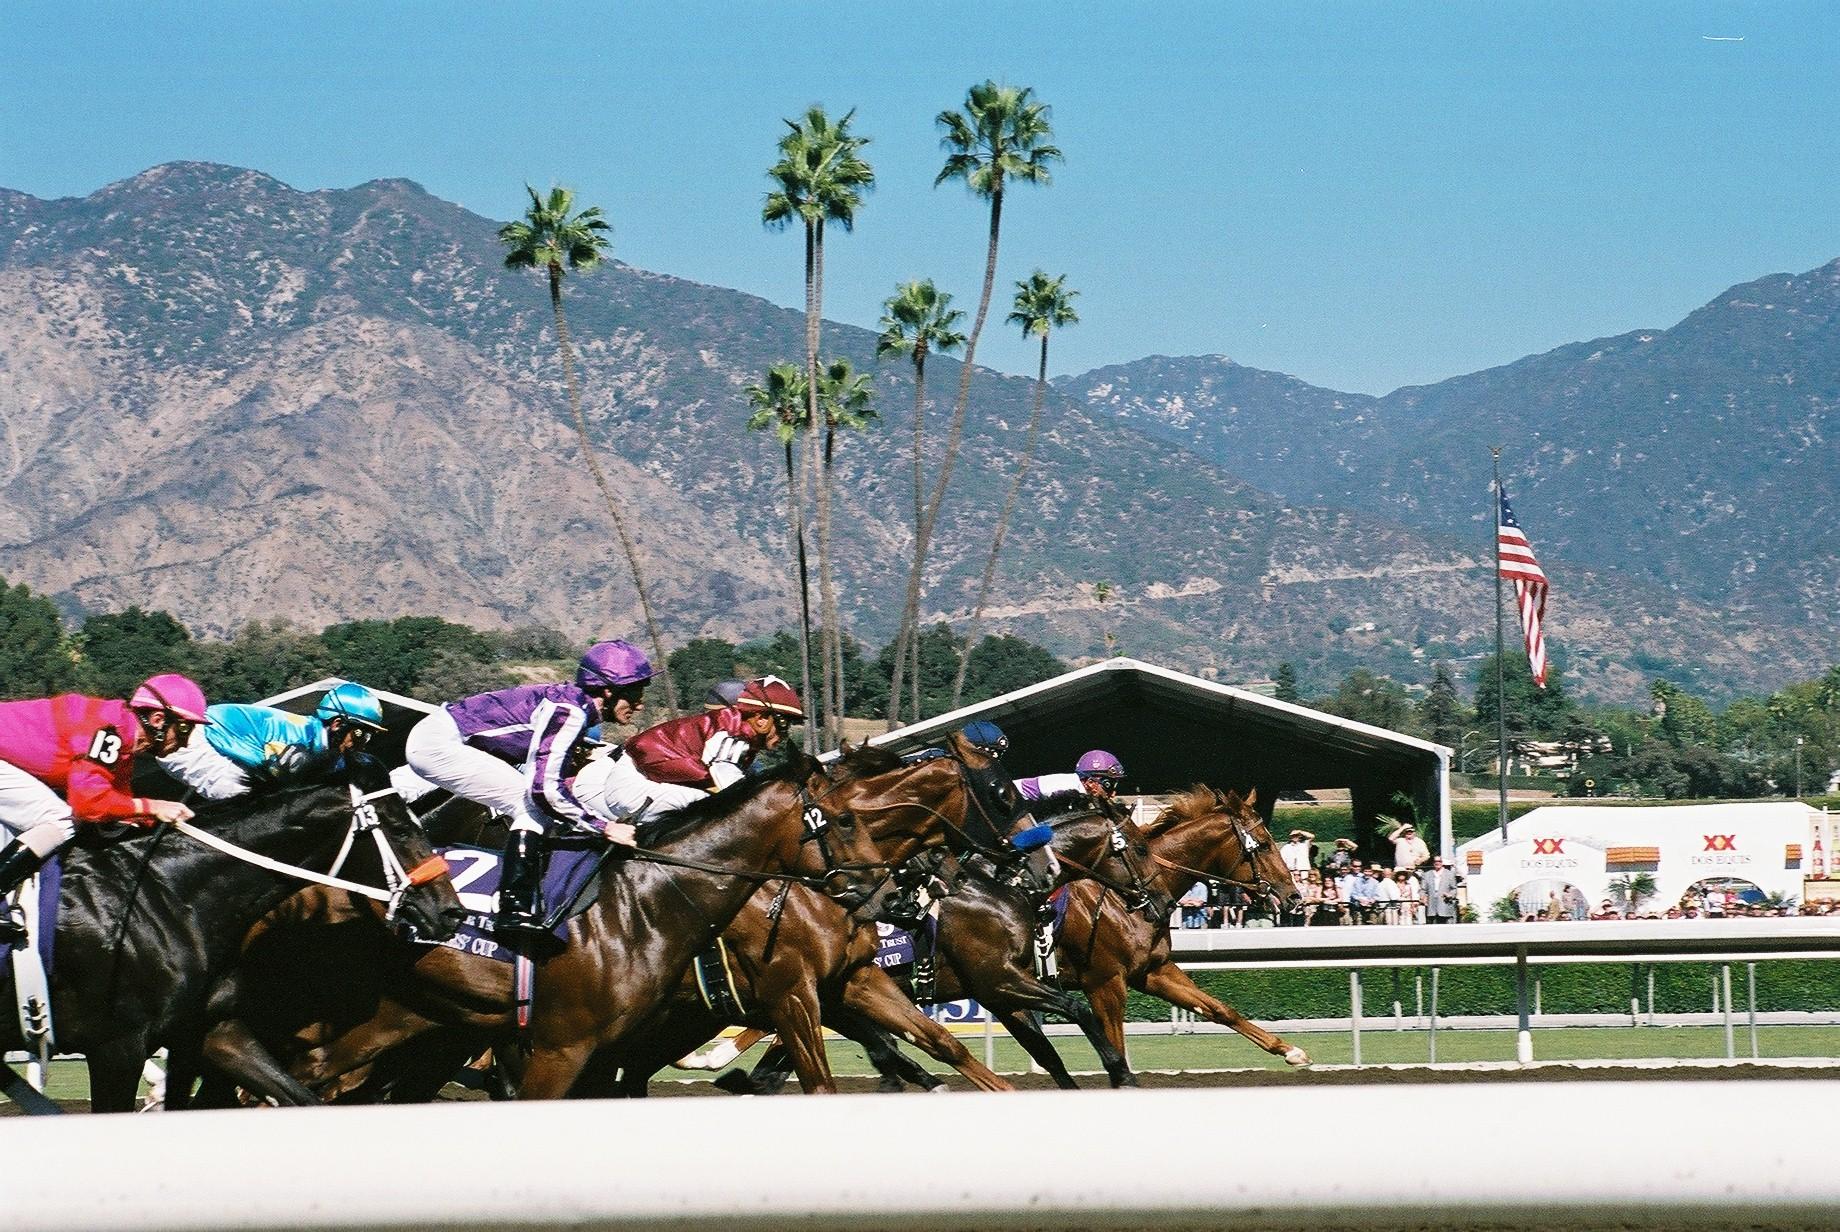 horse racing pix wikipedia